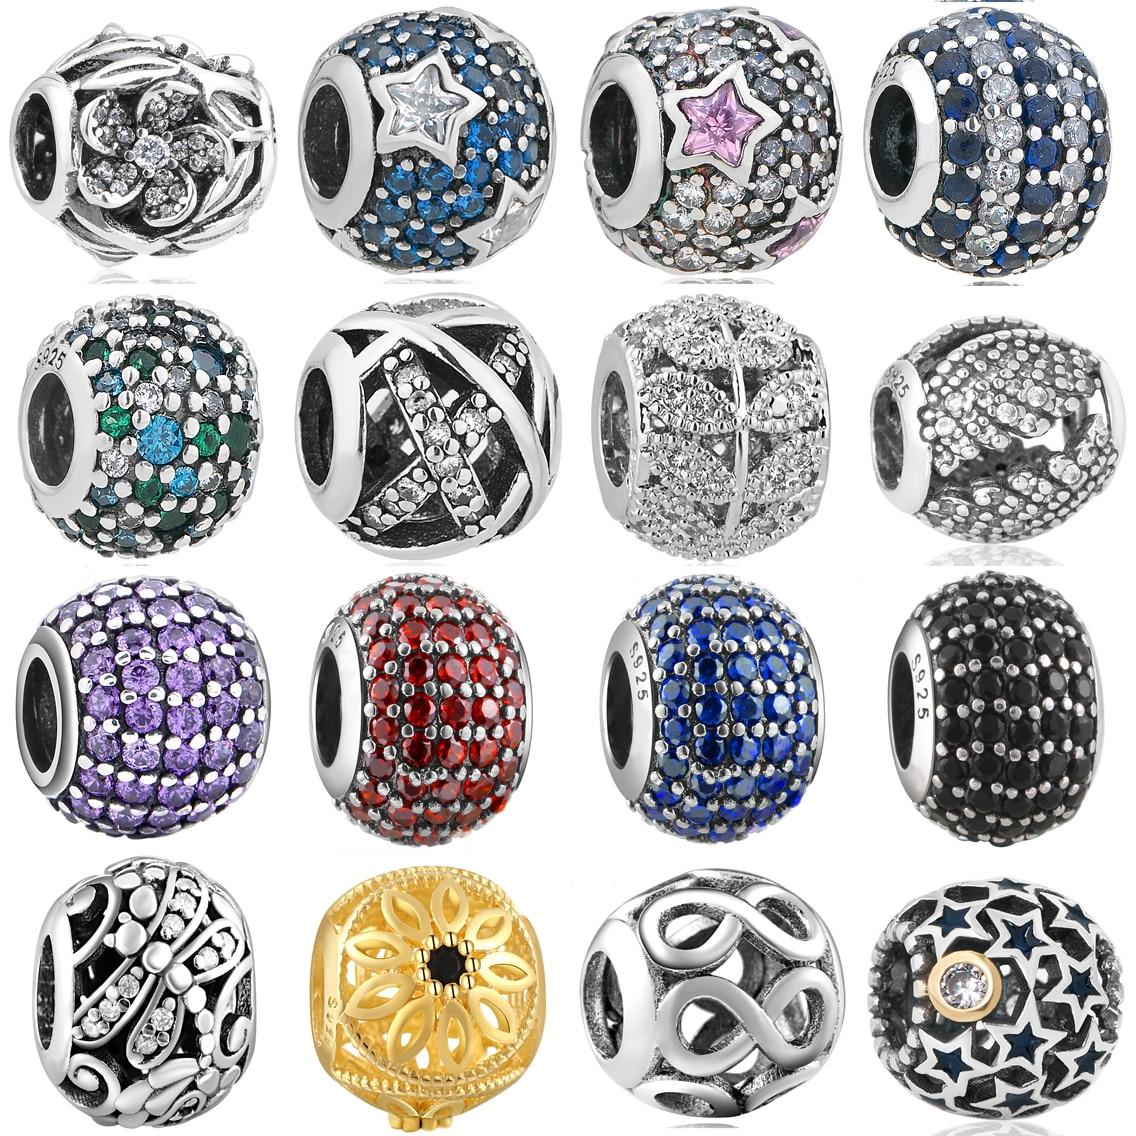 het 925 silver europa cubic zirconia charm pärlor Passar Pandora Style Armband Hängsmycke Halsband DIY Smycken Originals